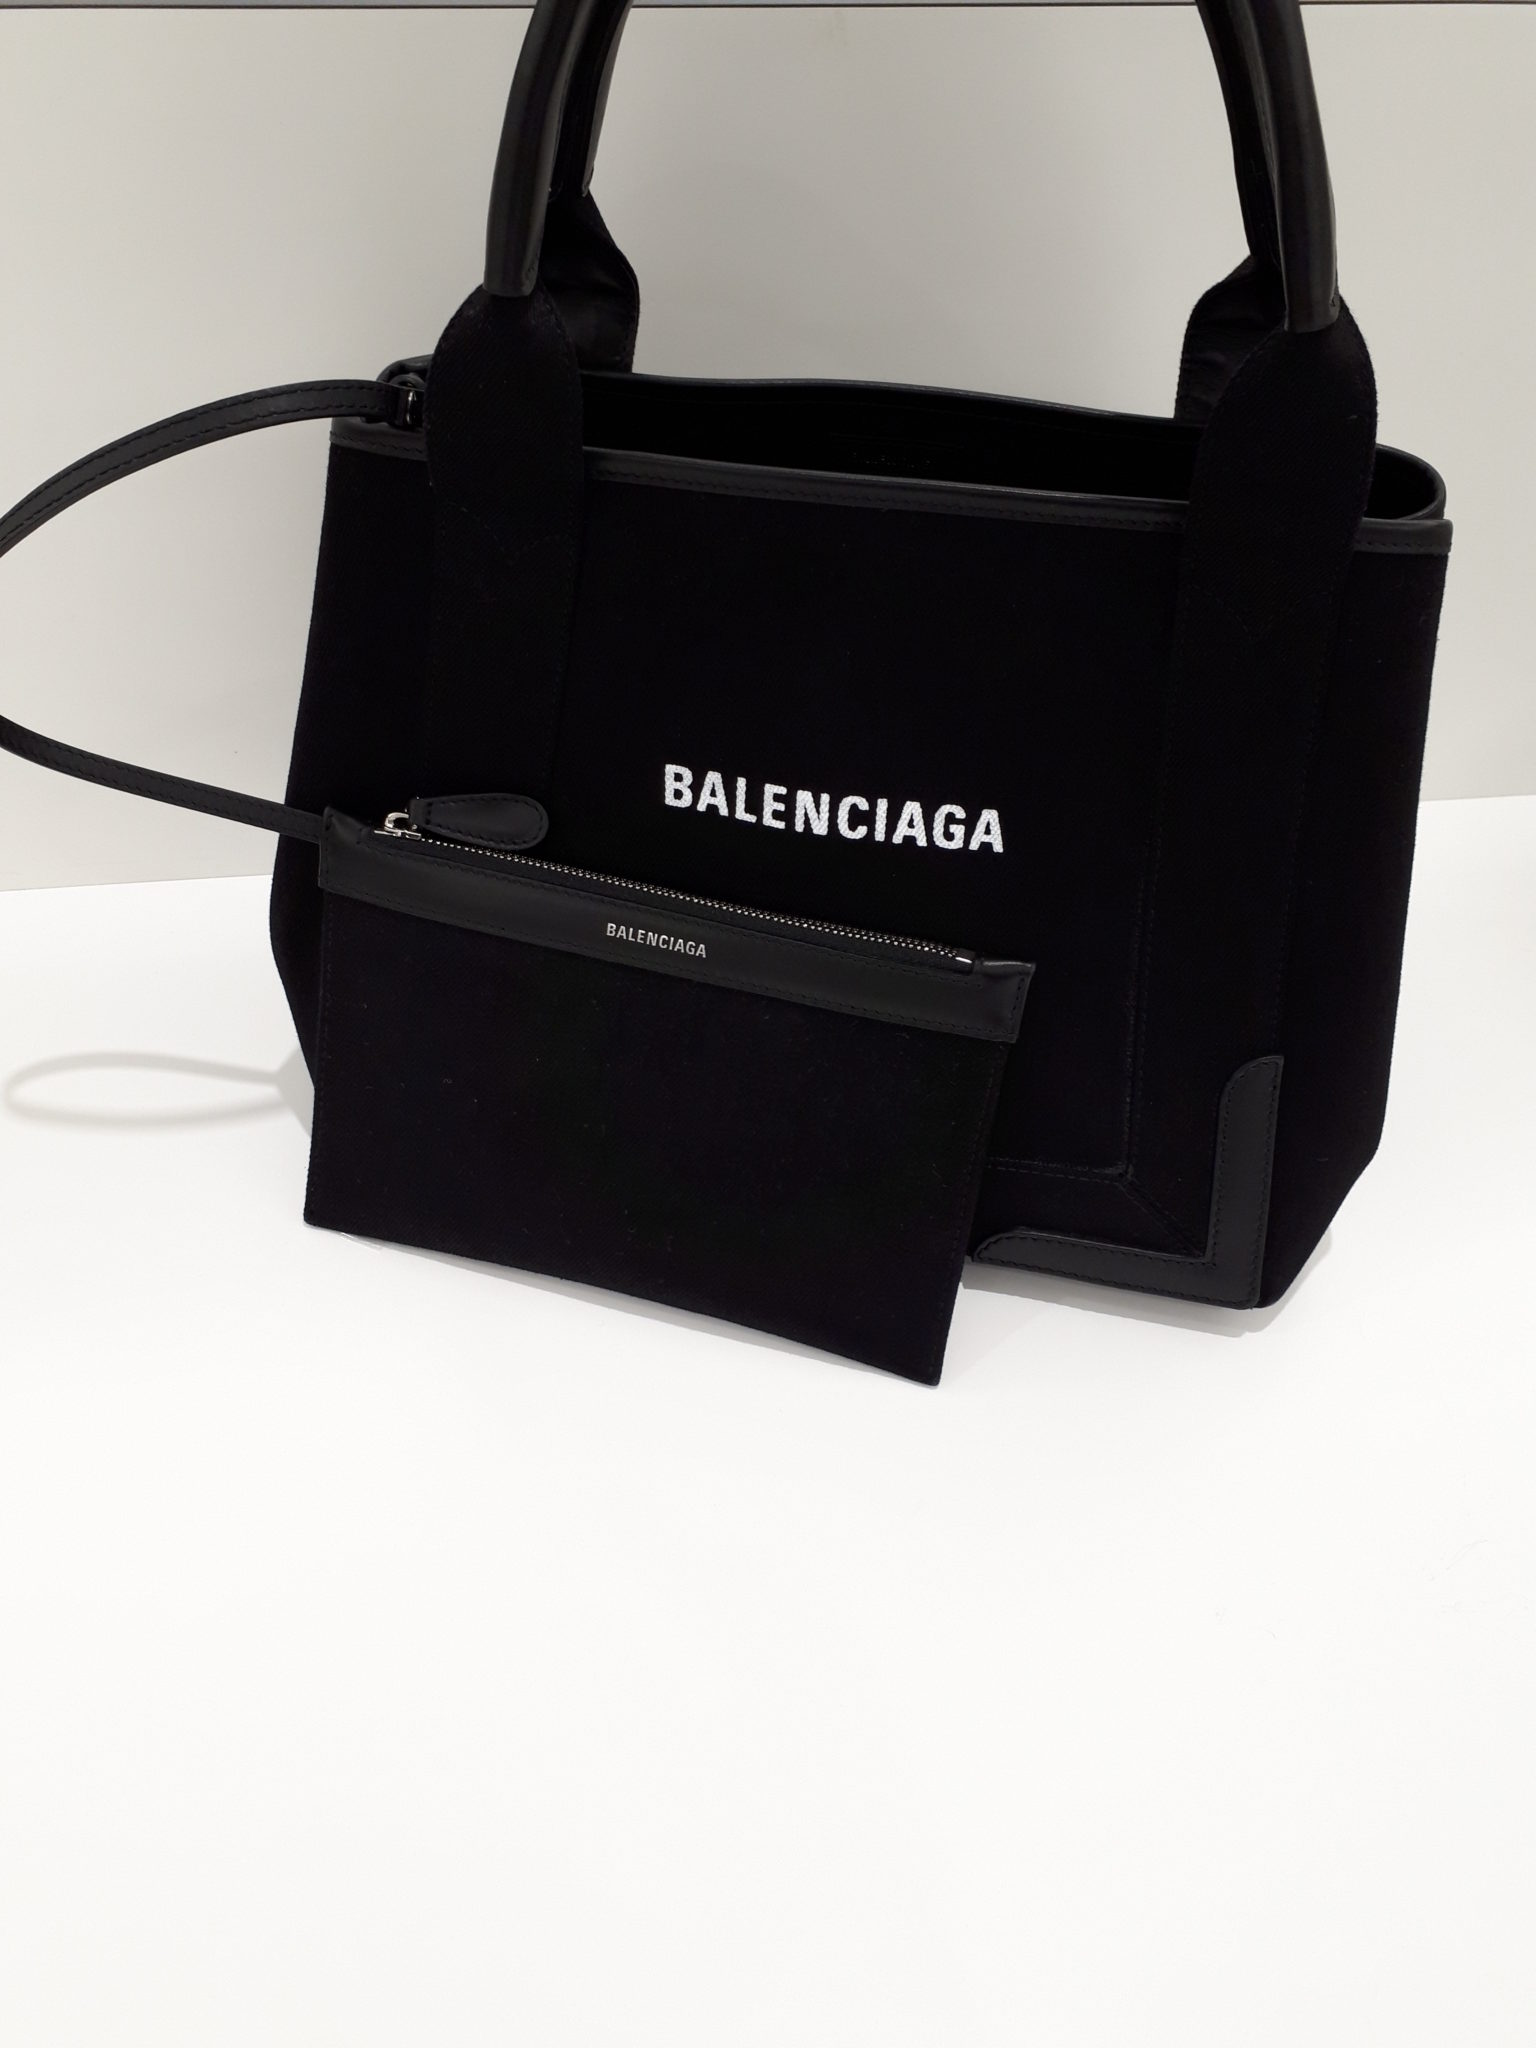 【BALENCIAGA バレンシアガ ネイビーカバSを盛岡市のお客様からお買取させて頂きました!】